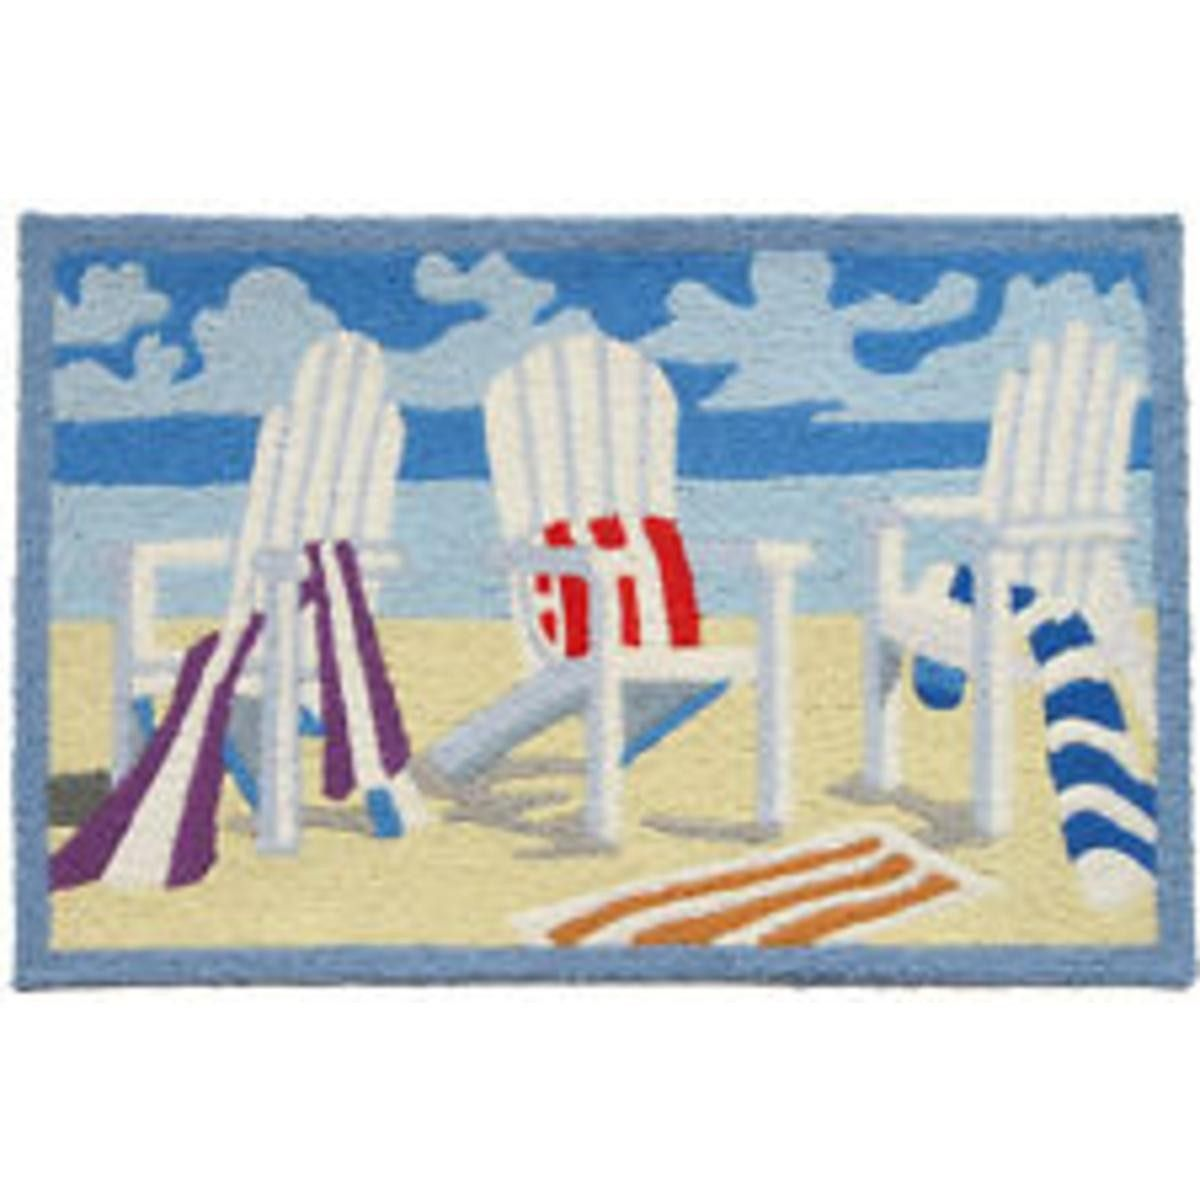 Home Comfort Jellybean Rug Adirondack Chair Embroidery Jb Pb 0003 Island Beach Gear S